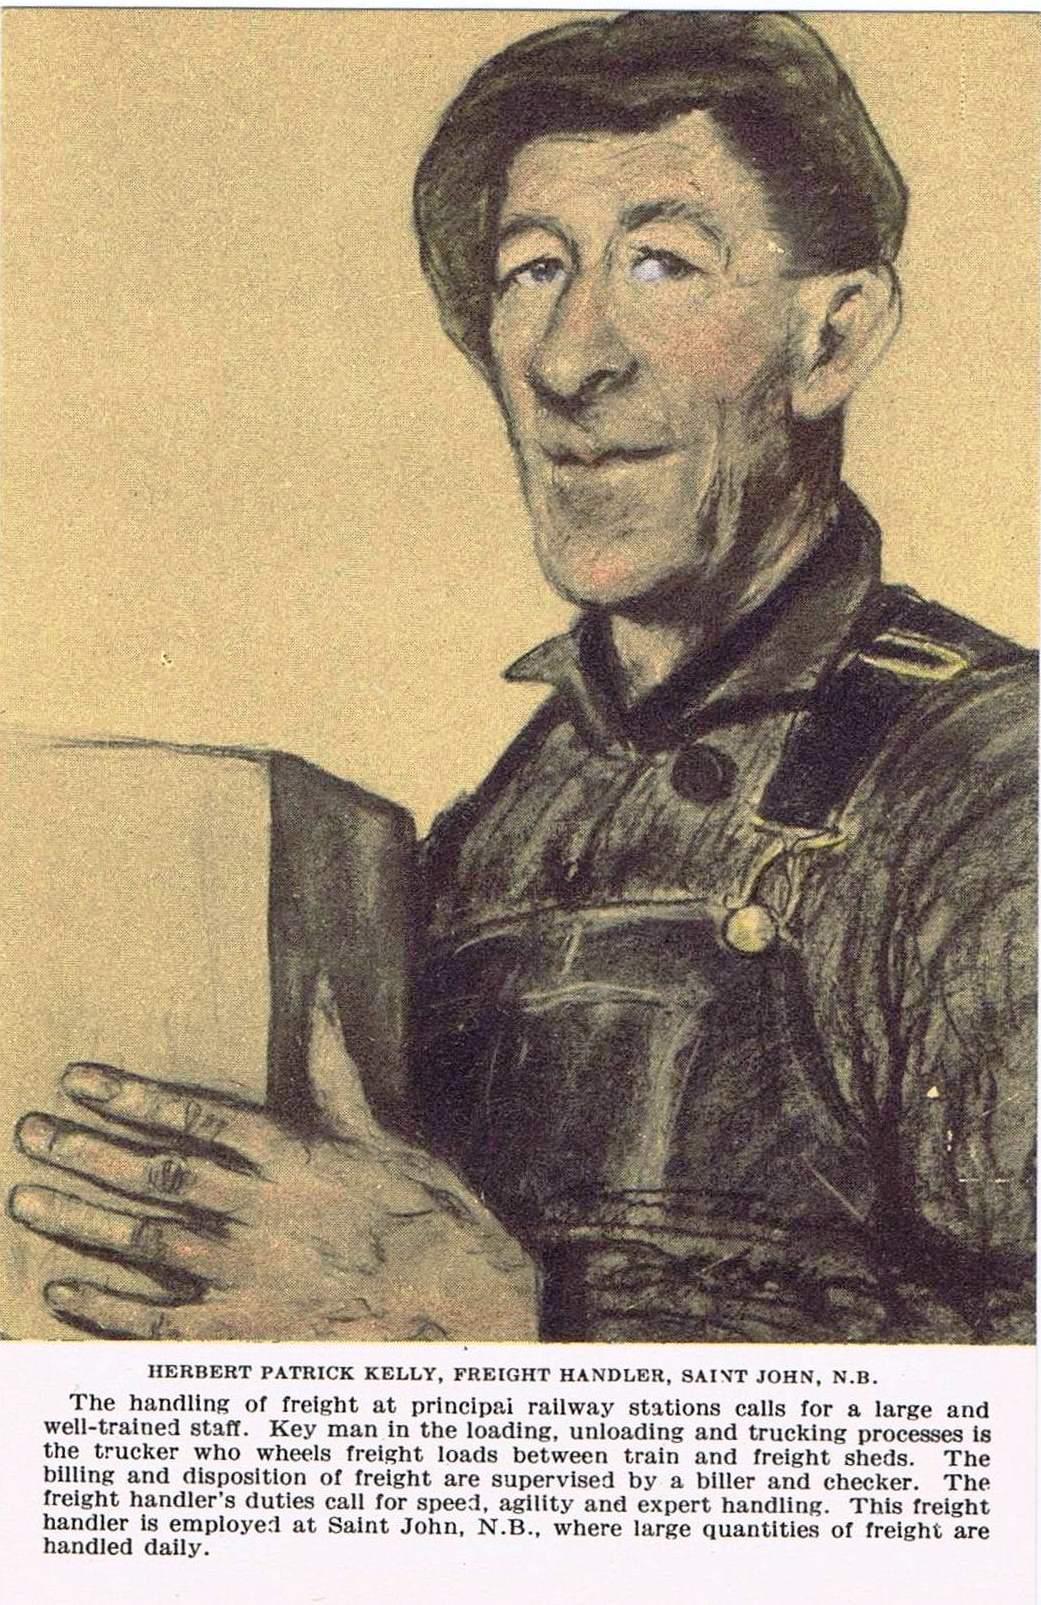 2H - Herbert Patrick Kelly, freight handler, Saint John, N.B.